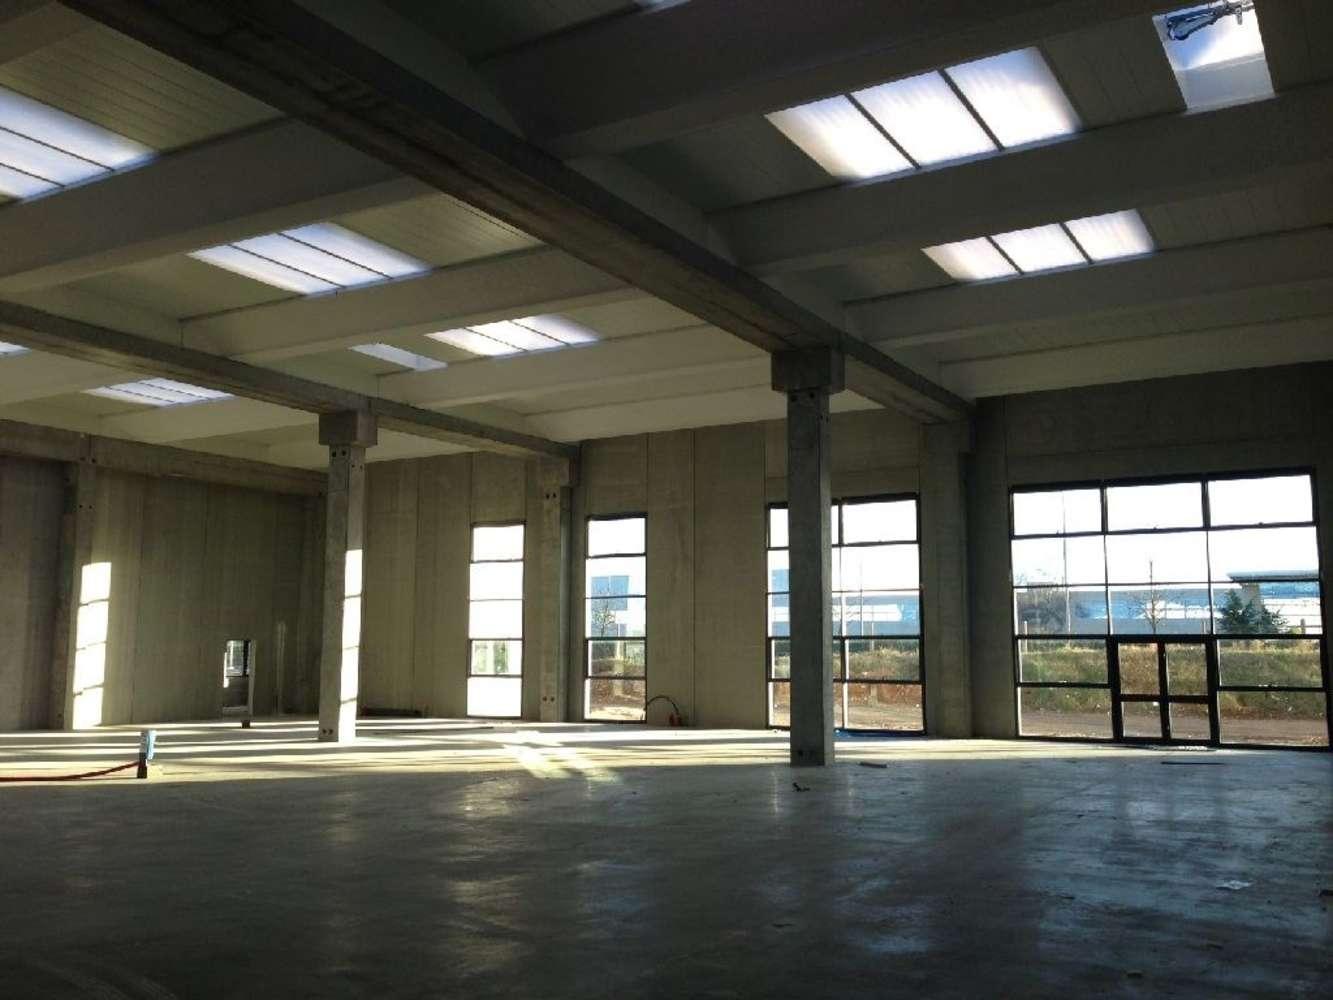 Activités/entrepôt Meyzieu, 69330 - Location locaux d'activité Meyzieu Lyon - 10067003